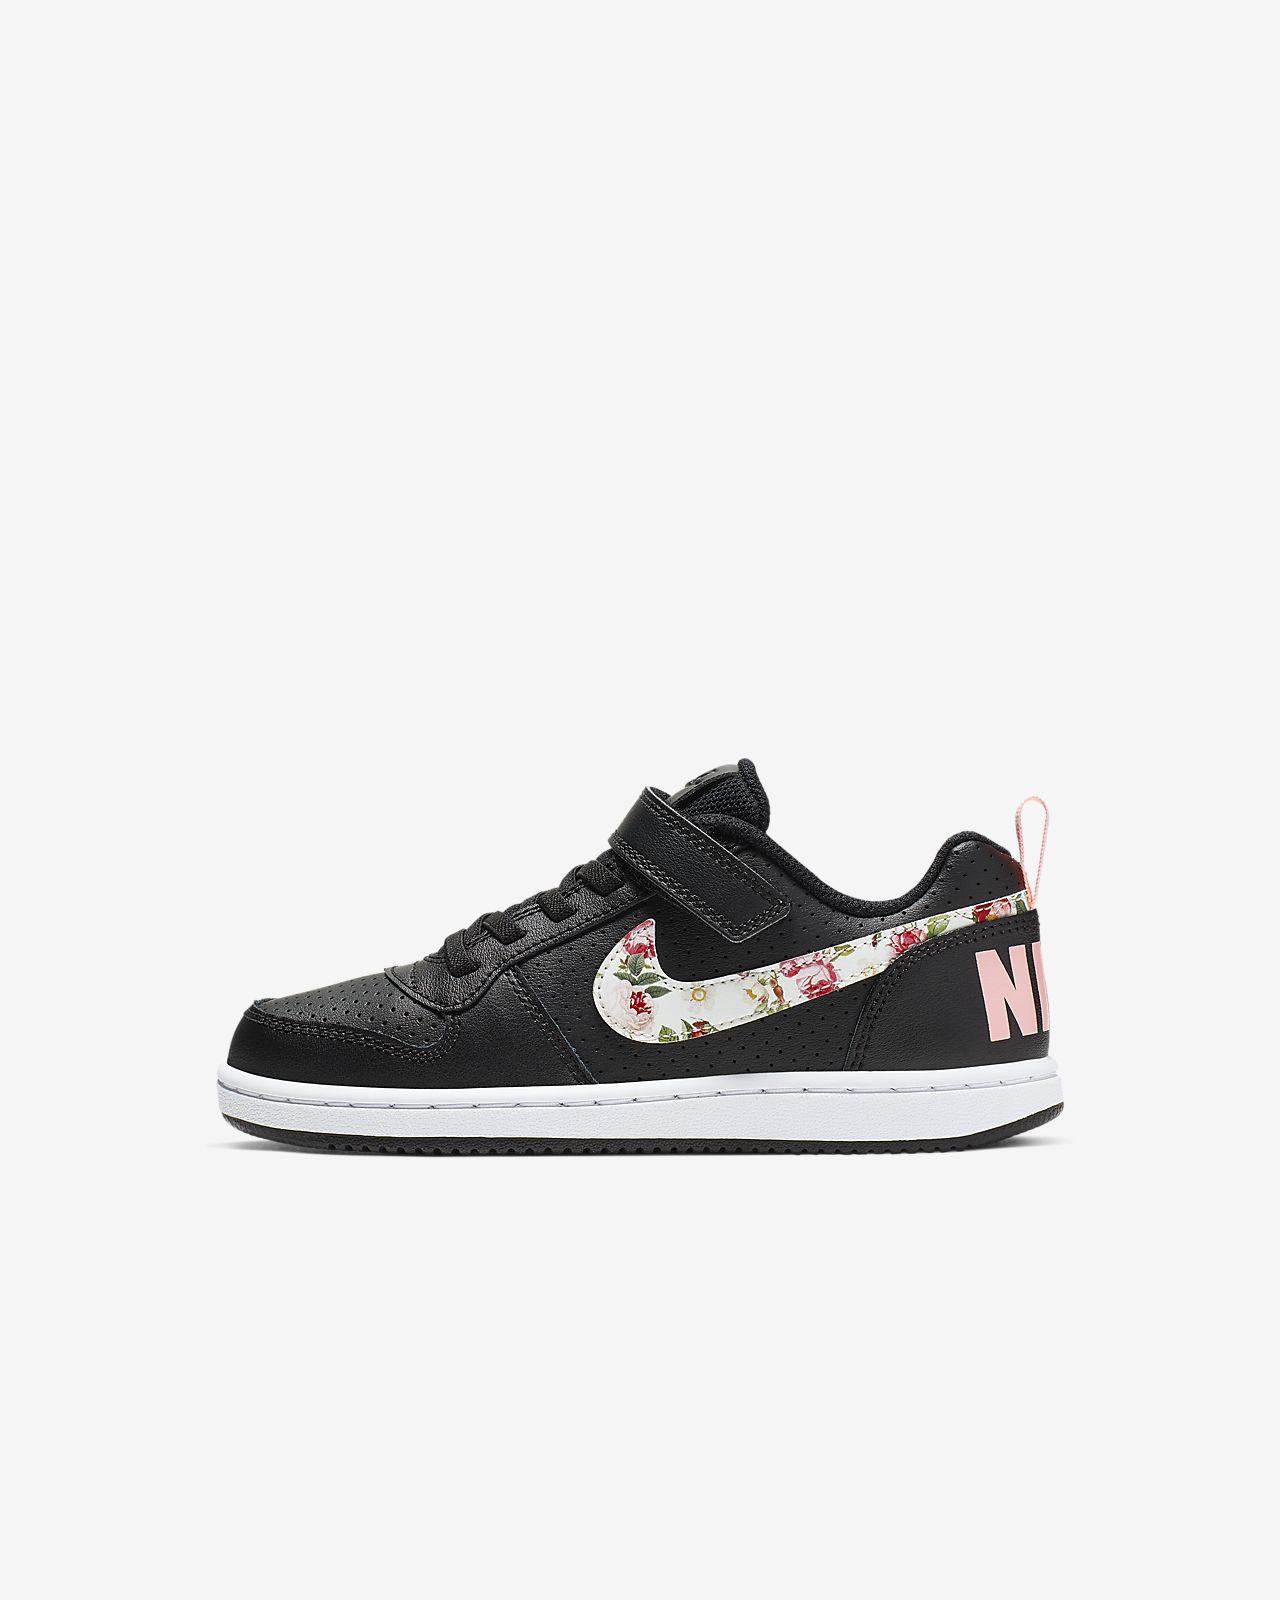 49bef8e801 Nike Court Borough Low Vintage Floral Little Kids' Shoe. Nike.com